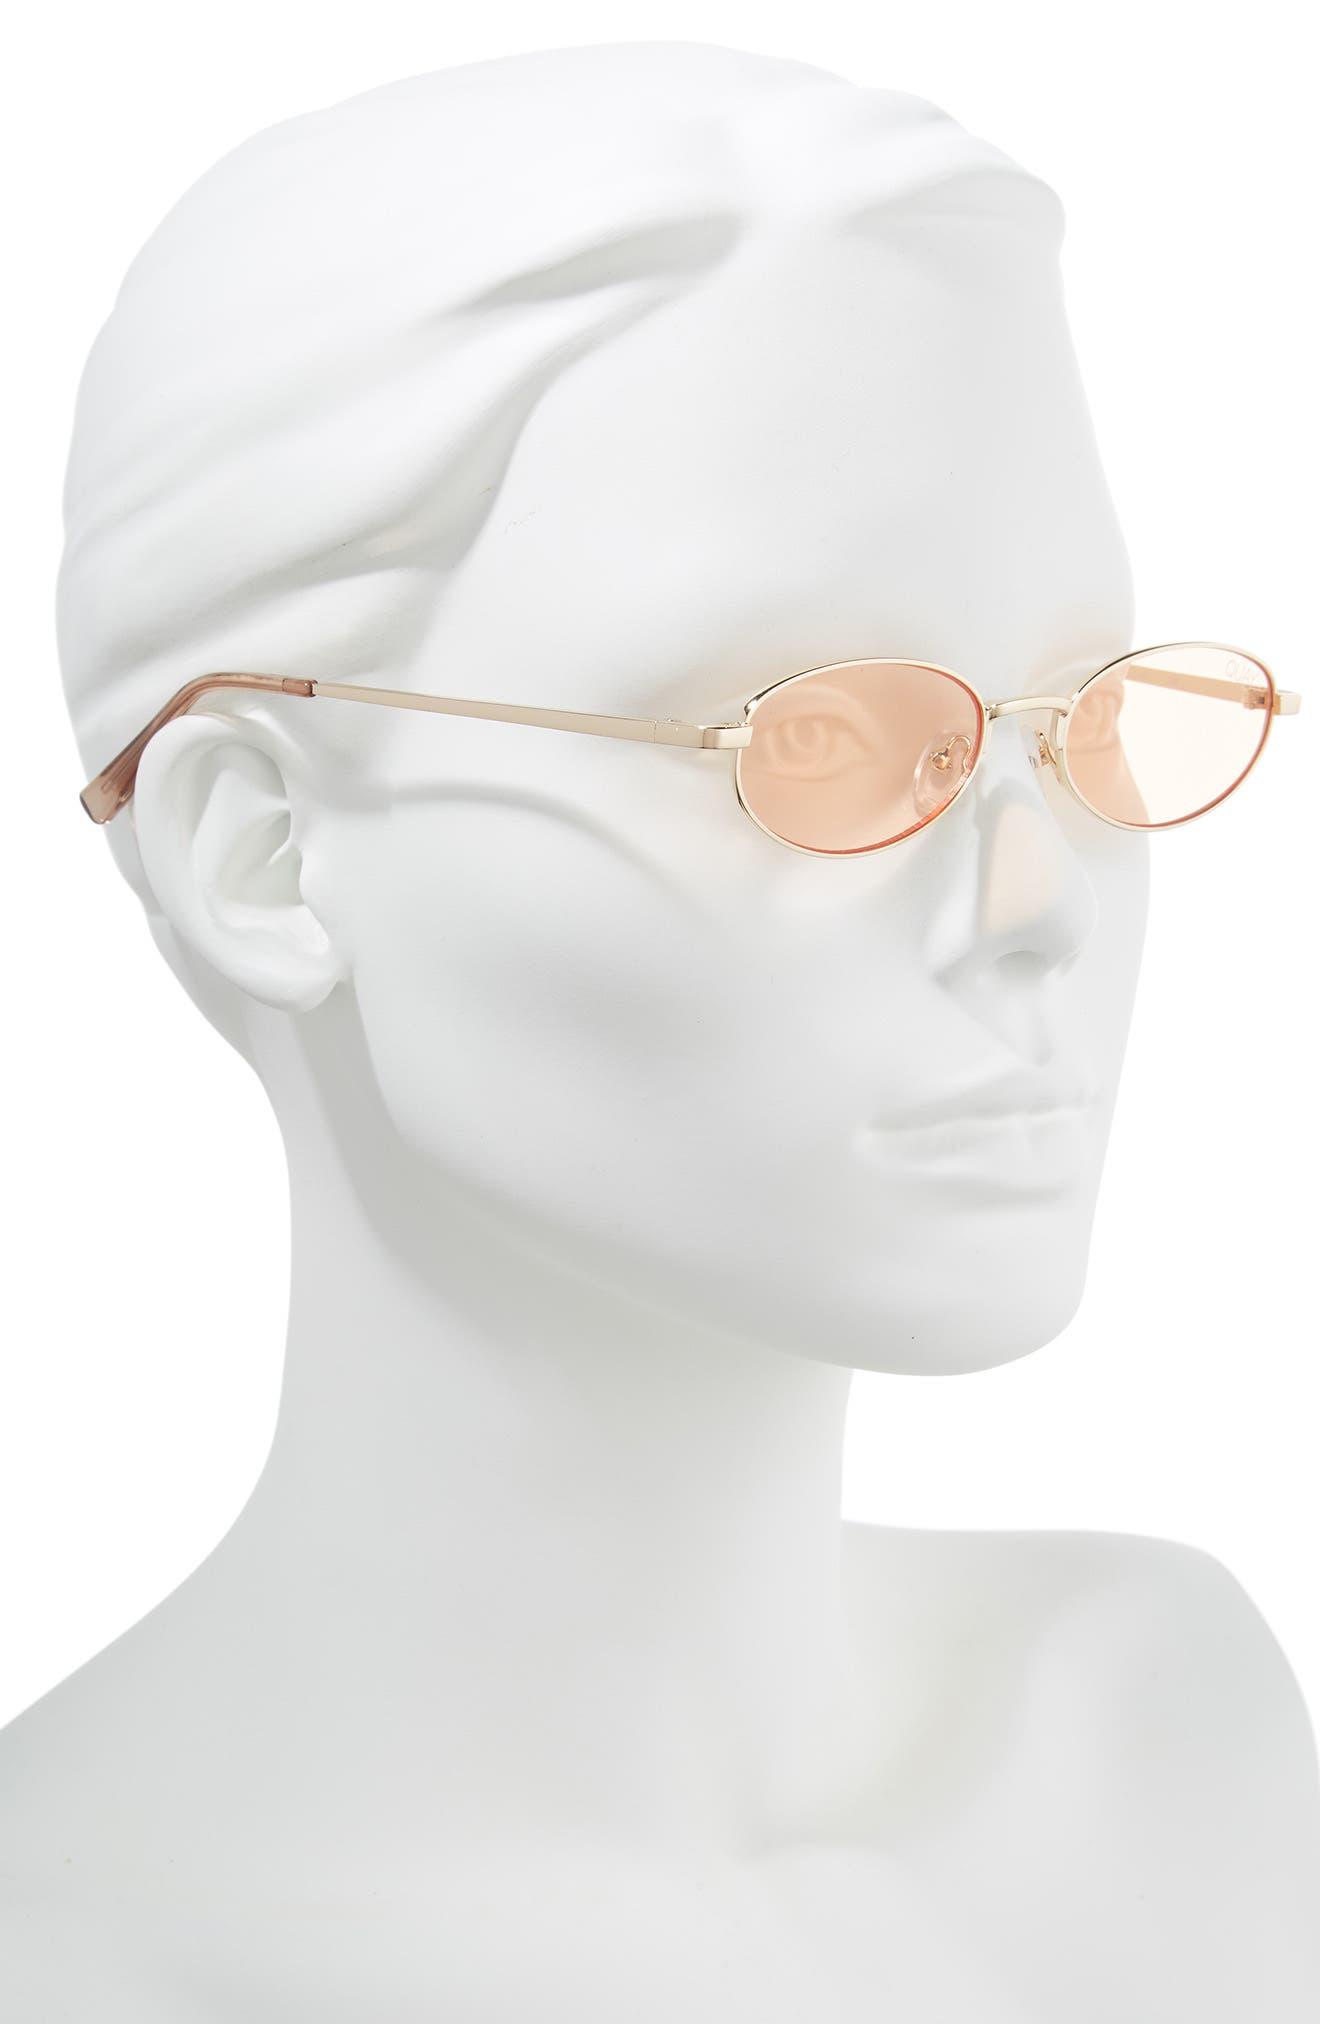 49mm Showdown Oval Sunglasses,                             Alternate thumbnail 2, color,                             GOLD